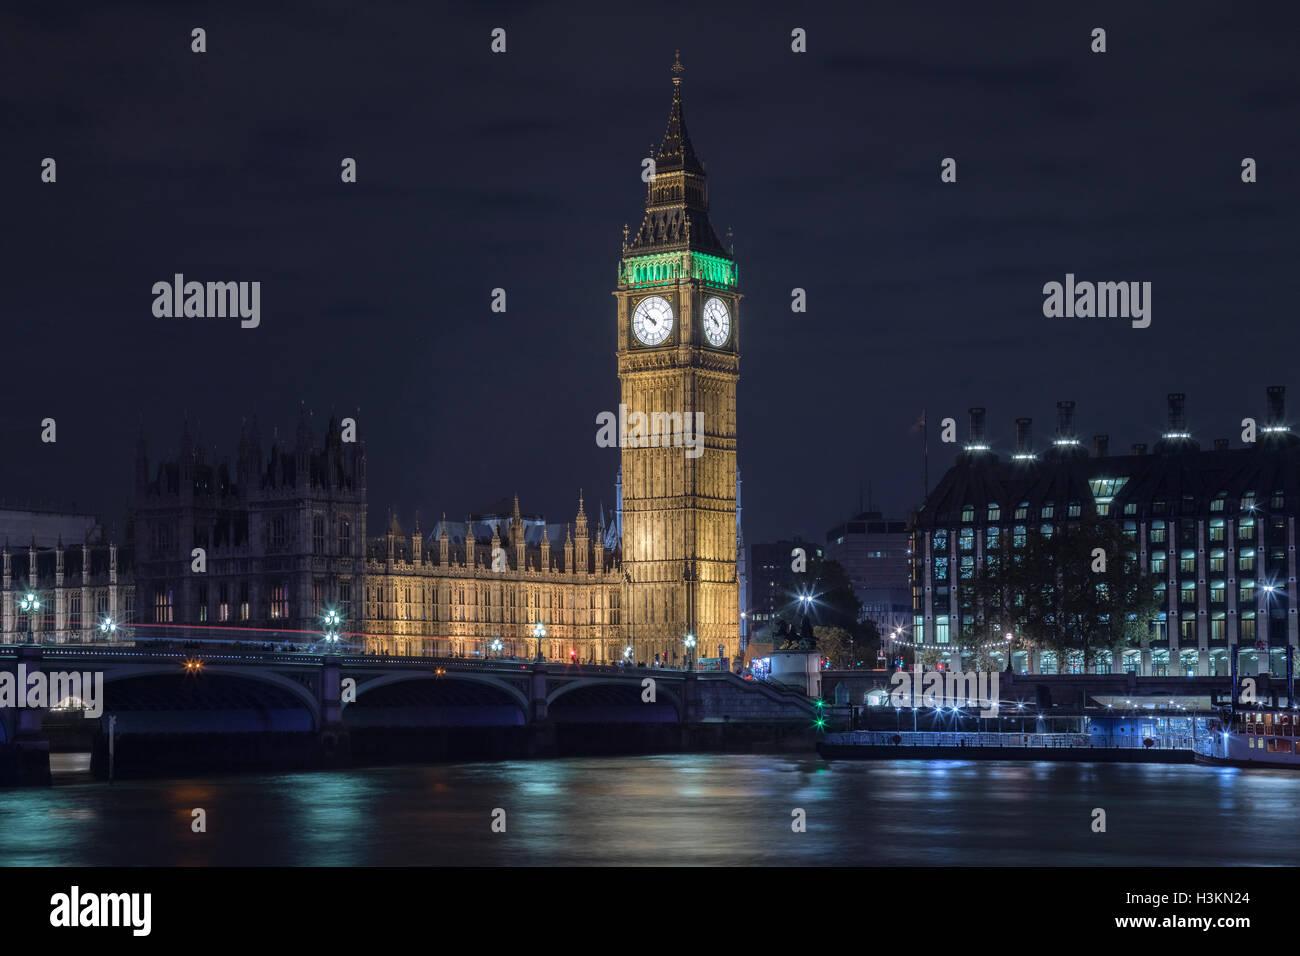 Westminster, Big Ben, London, England, UK - Stock Image